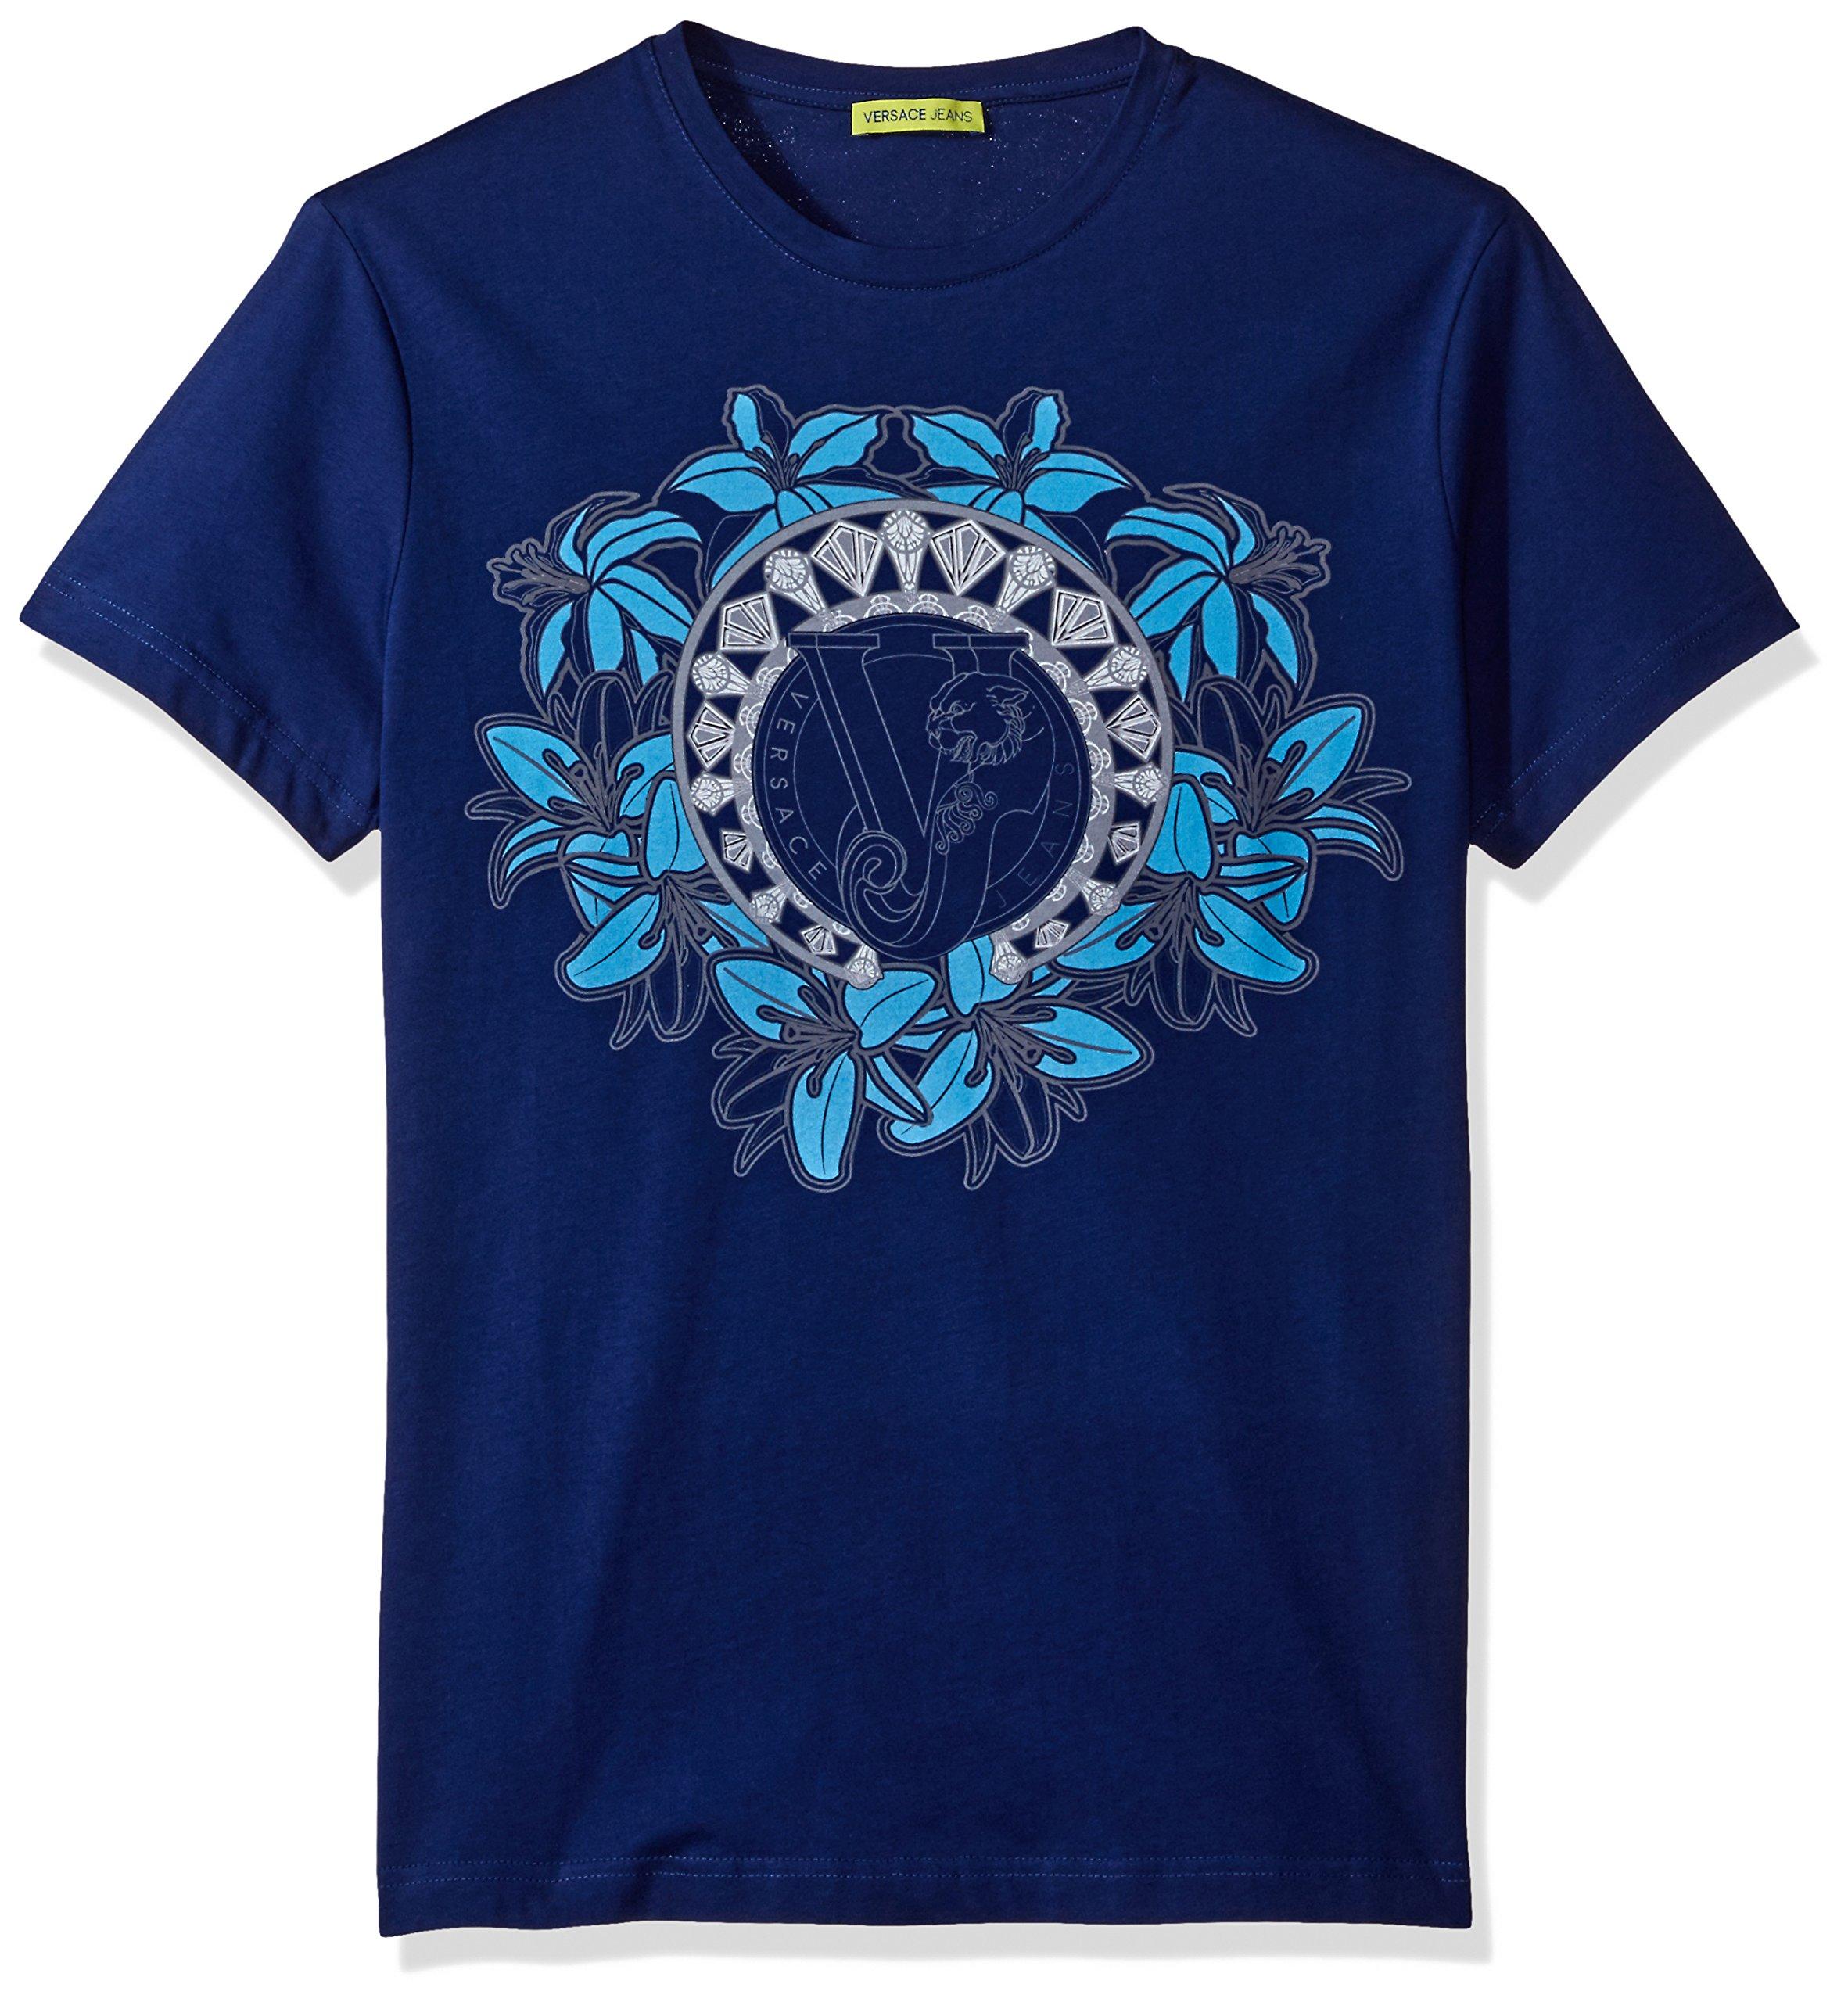 Versace Jeans Men's Graphic Circle Logo T-Shirt, Blue, X-Large